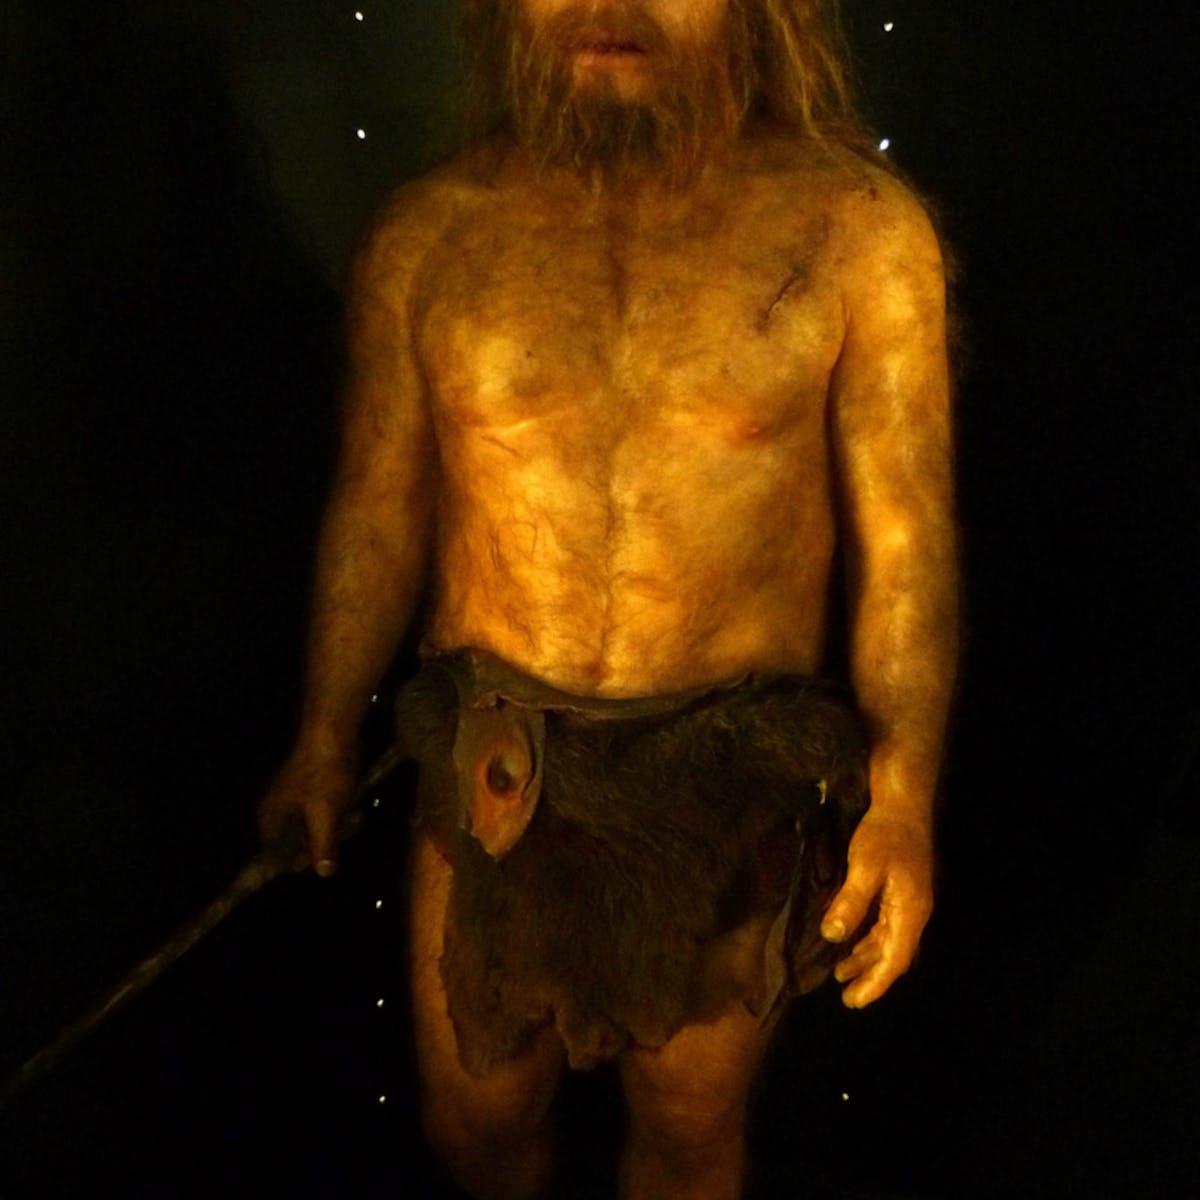 Neanderthals Passed Down Life-Saving Genes to Their Human Hybrid Children